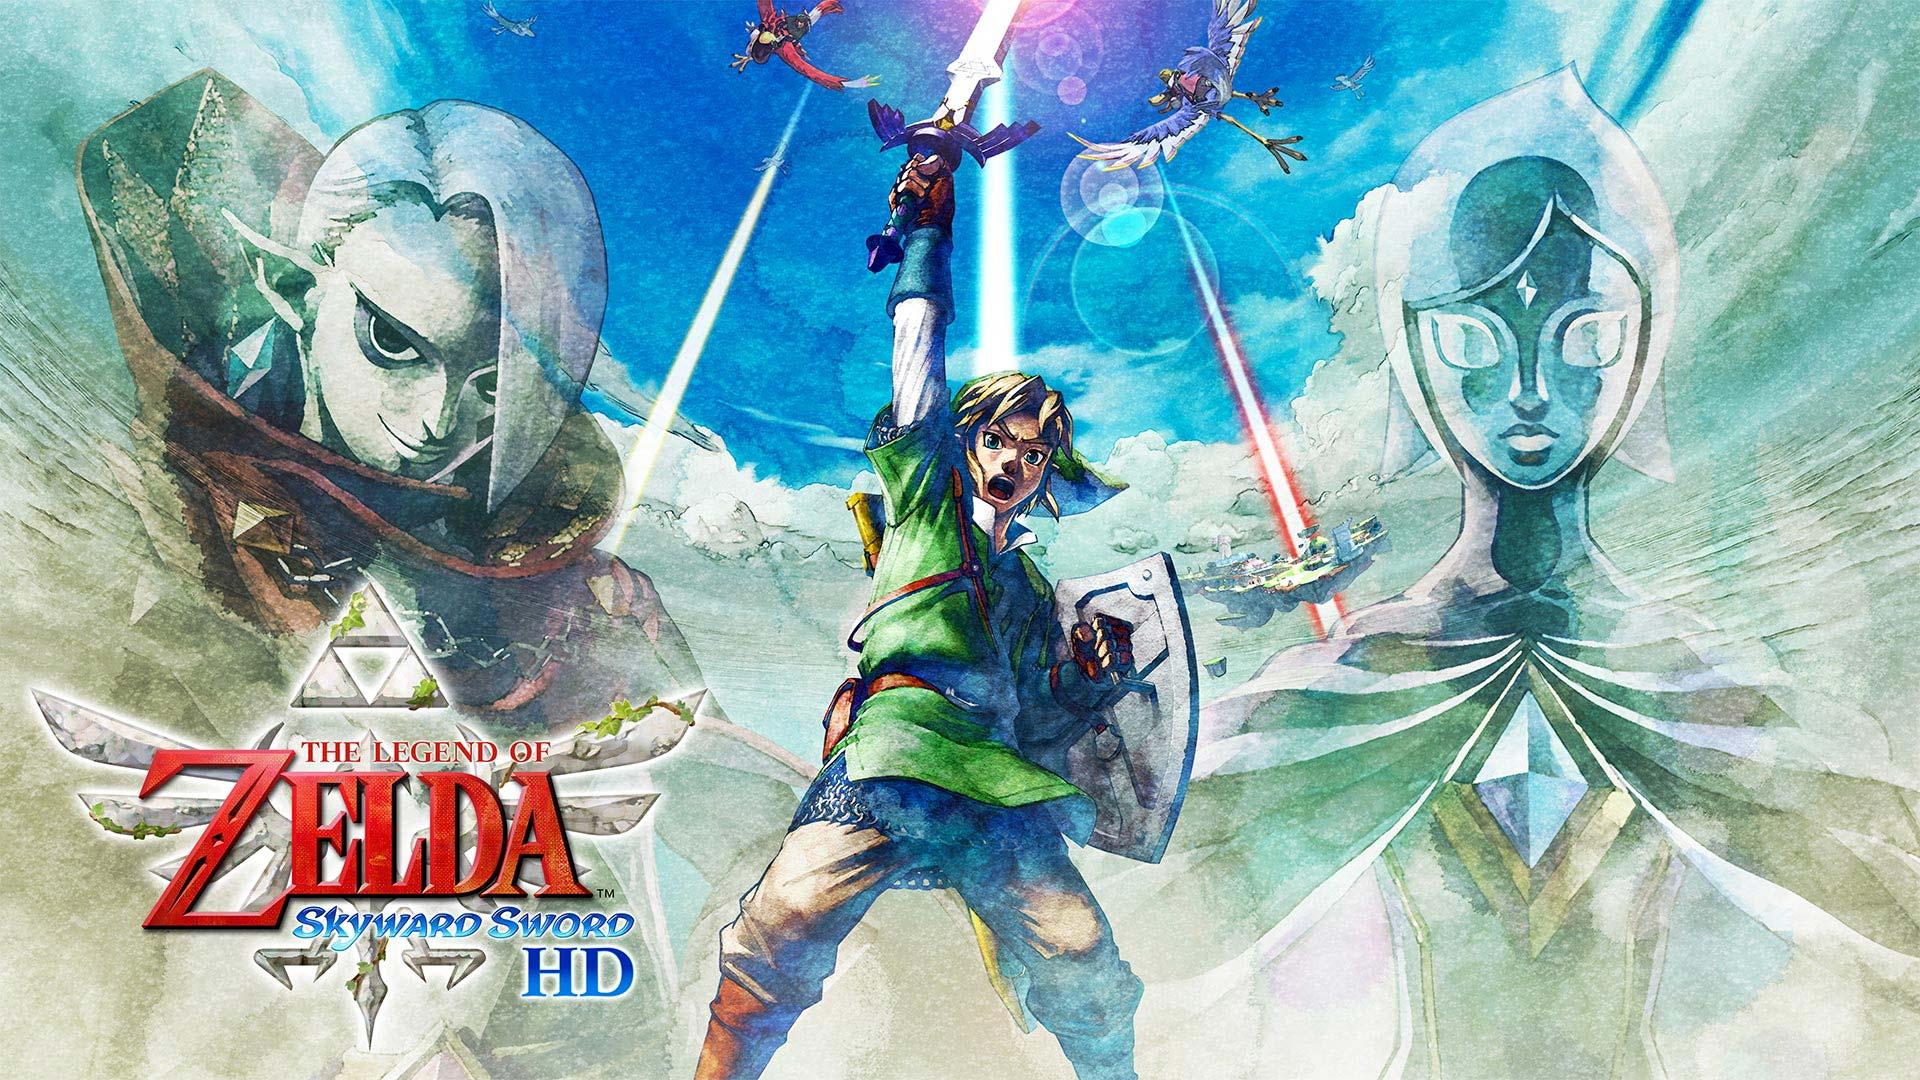 The Legend of Zelda: Skyward Sword HD Critic Review